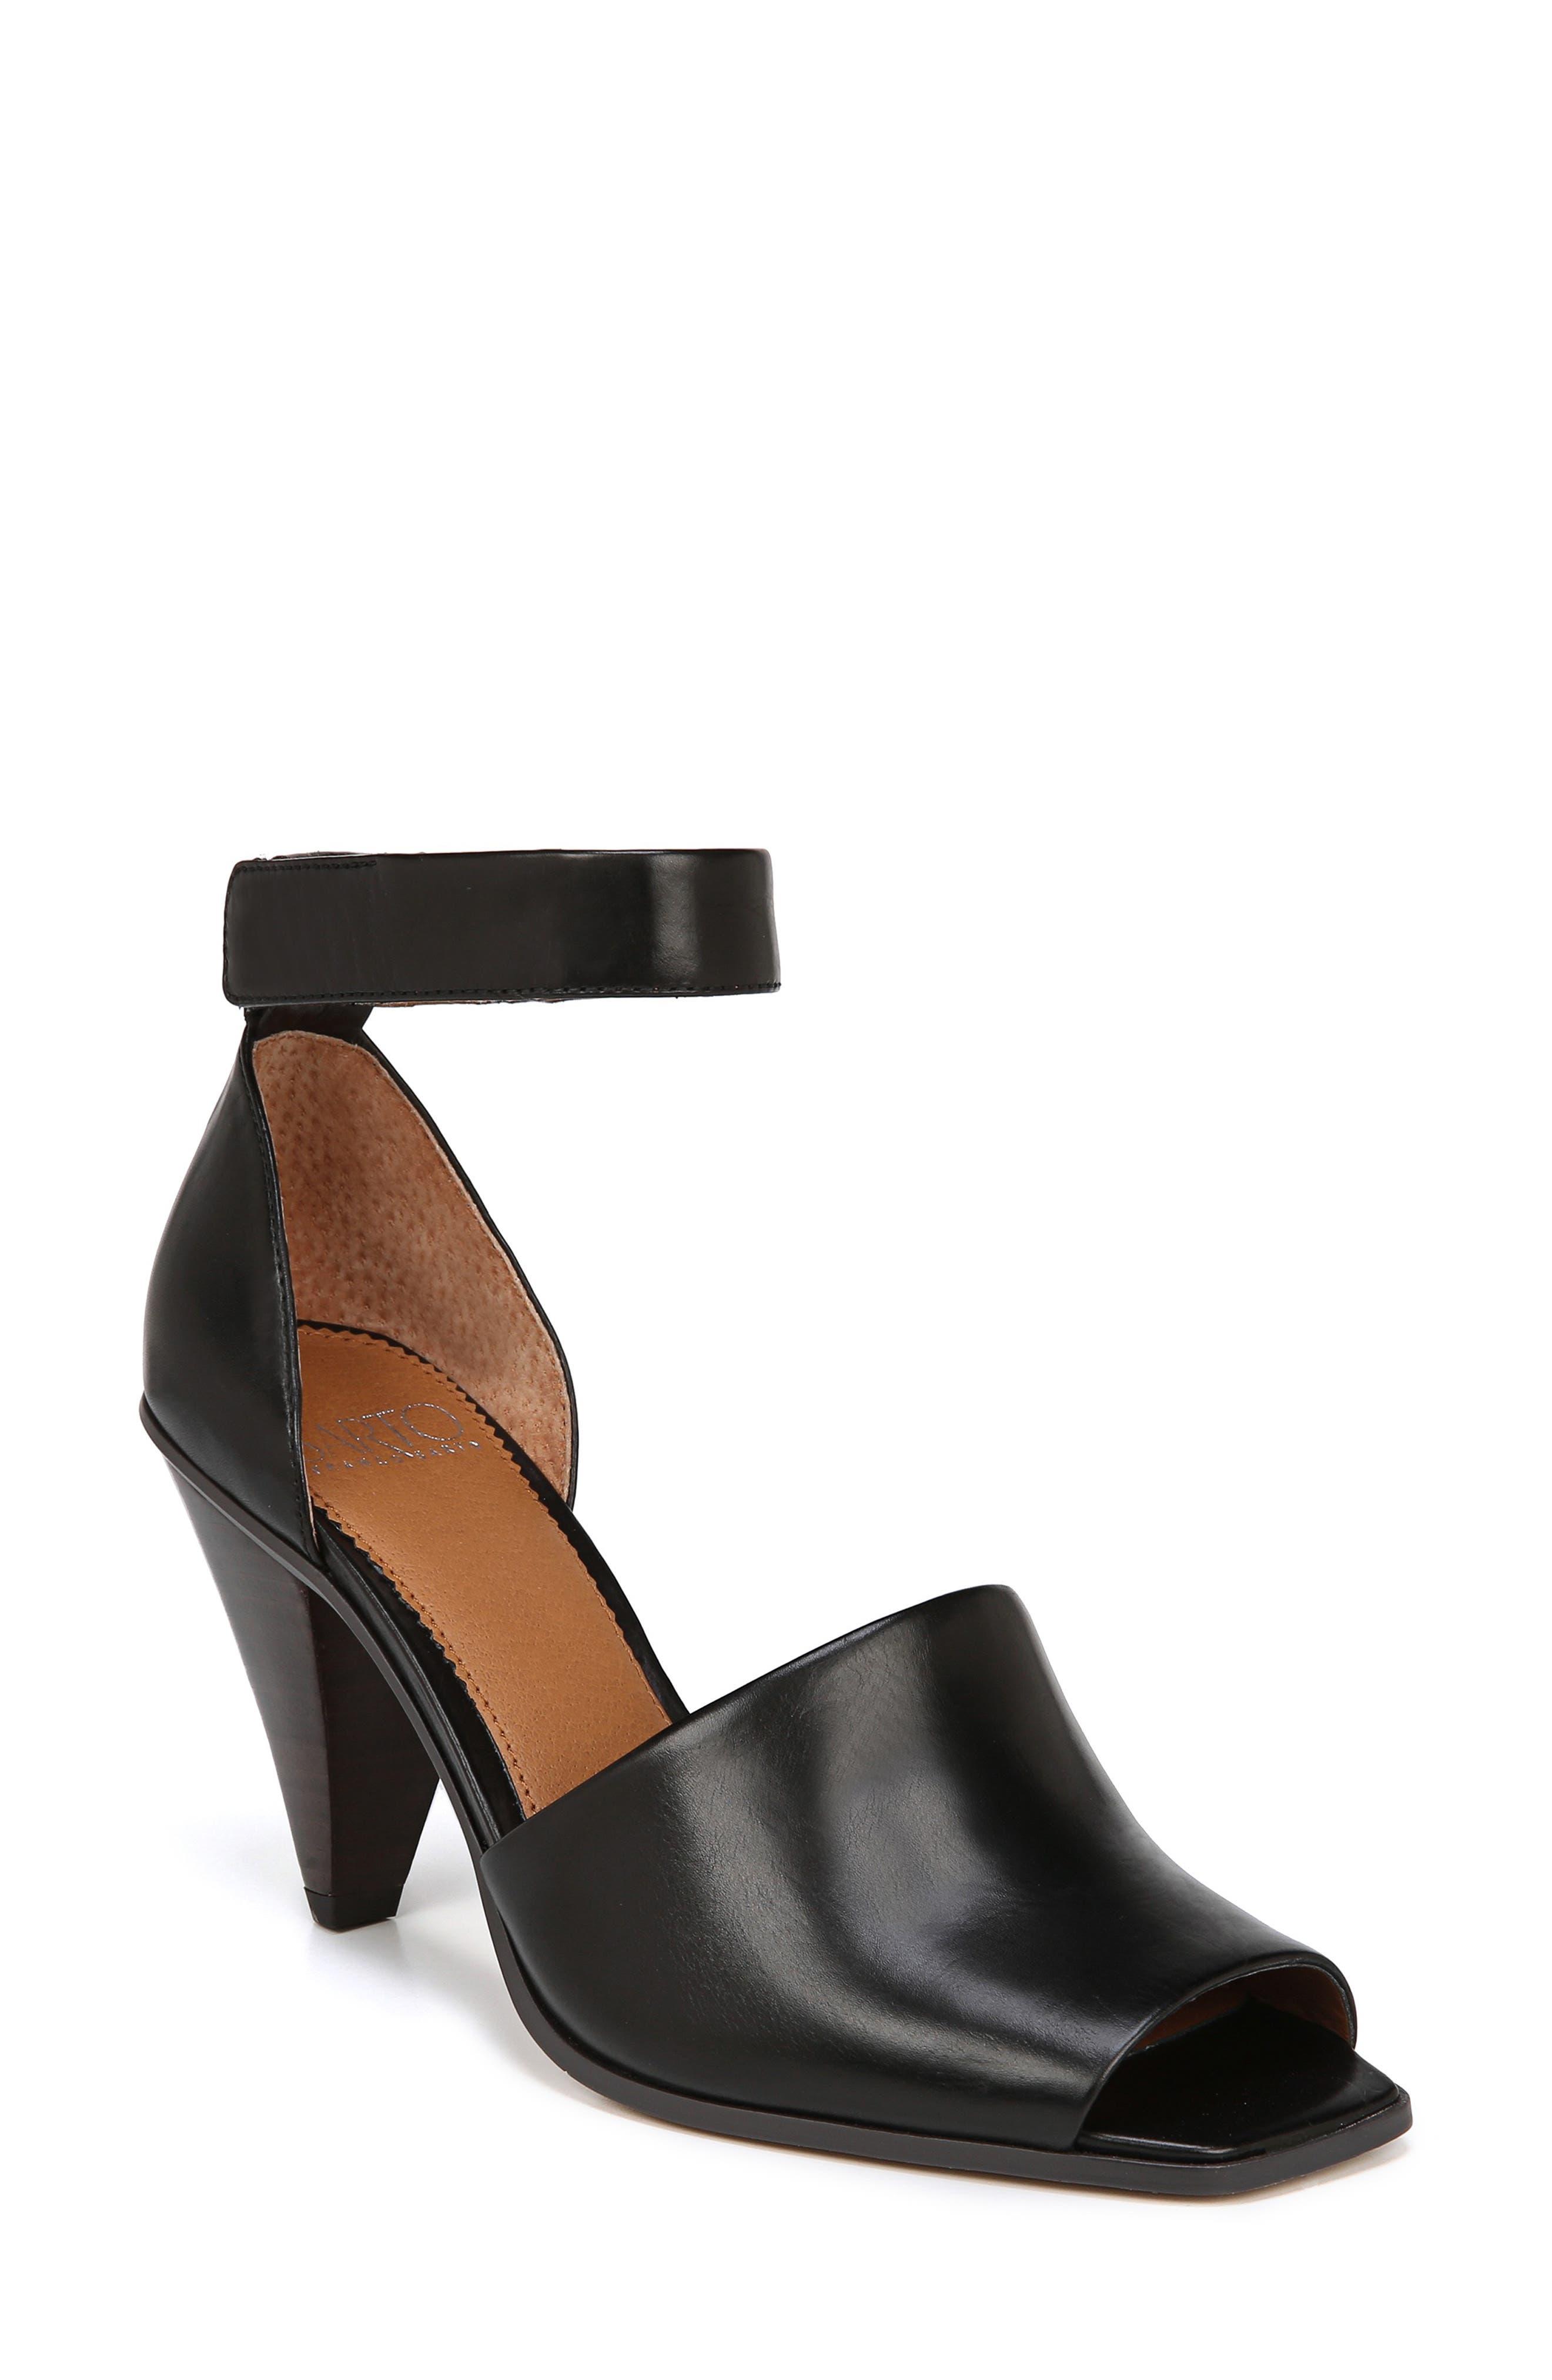 SARTO BY FRANCO SARTO Ankle Strap Sandal, Main, color, BLACK FOULARD LEATHER